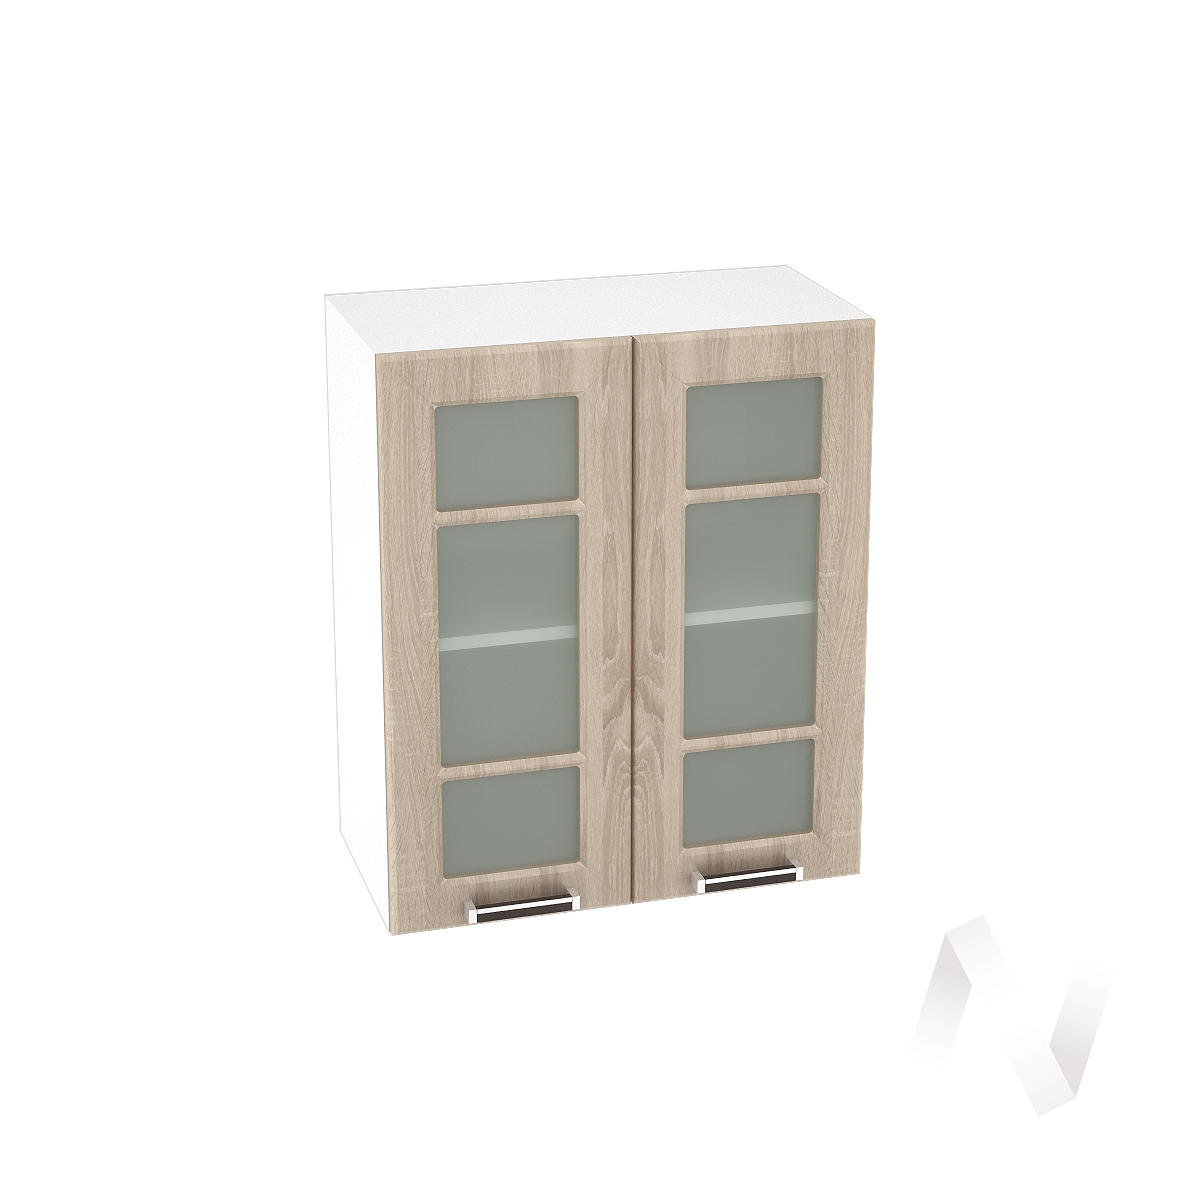 "Кухня ""Прага"": Шкаф верхний со стеклом 600, ШВС 600 (дуб сонома/корпус белый)"